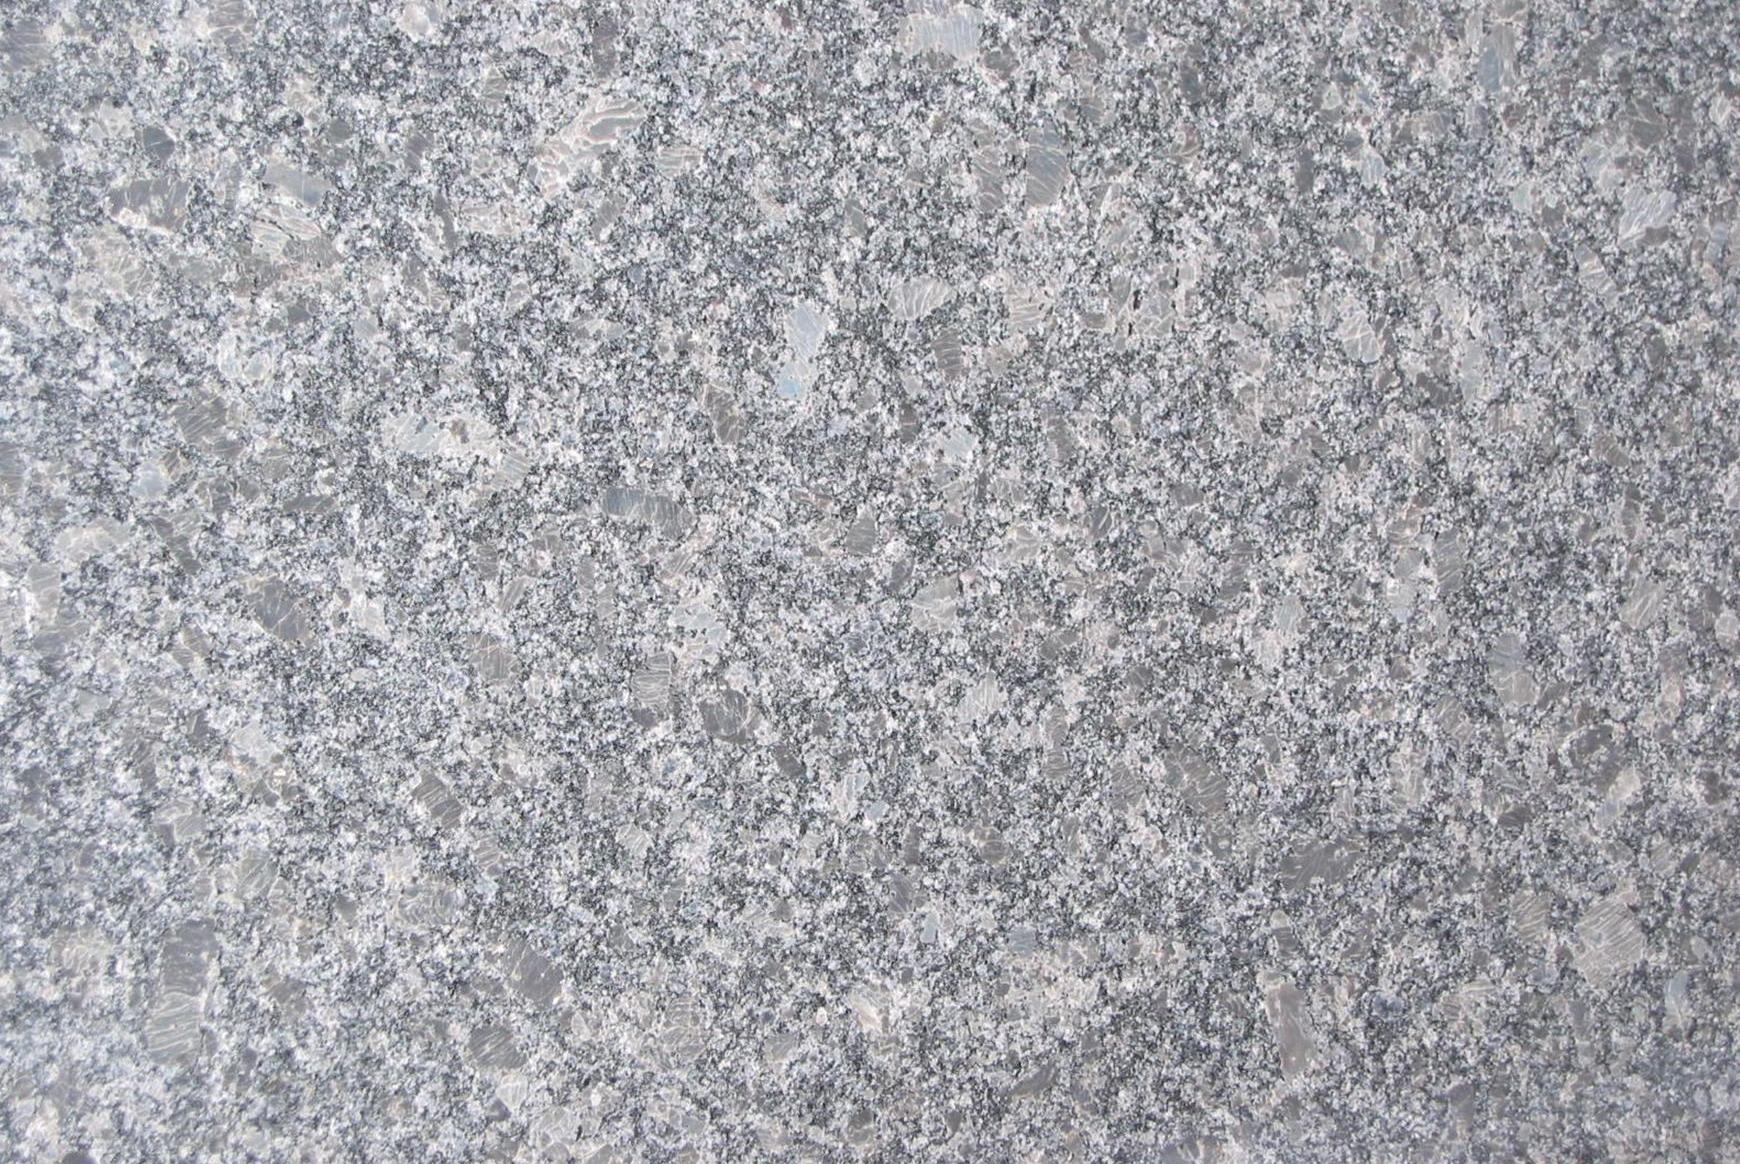 Grey Granite Slabs : Steel grey granite tiles slabs and countertops dark